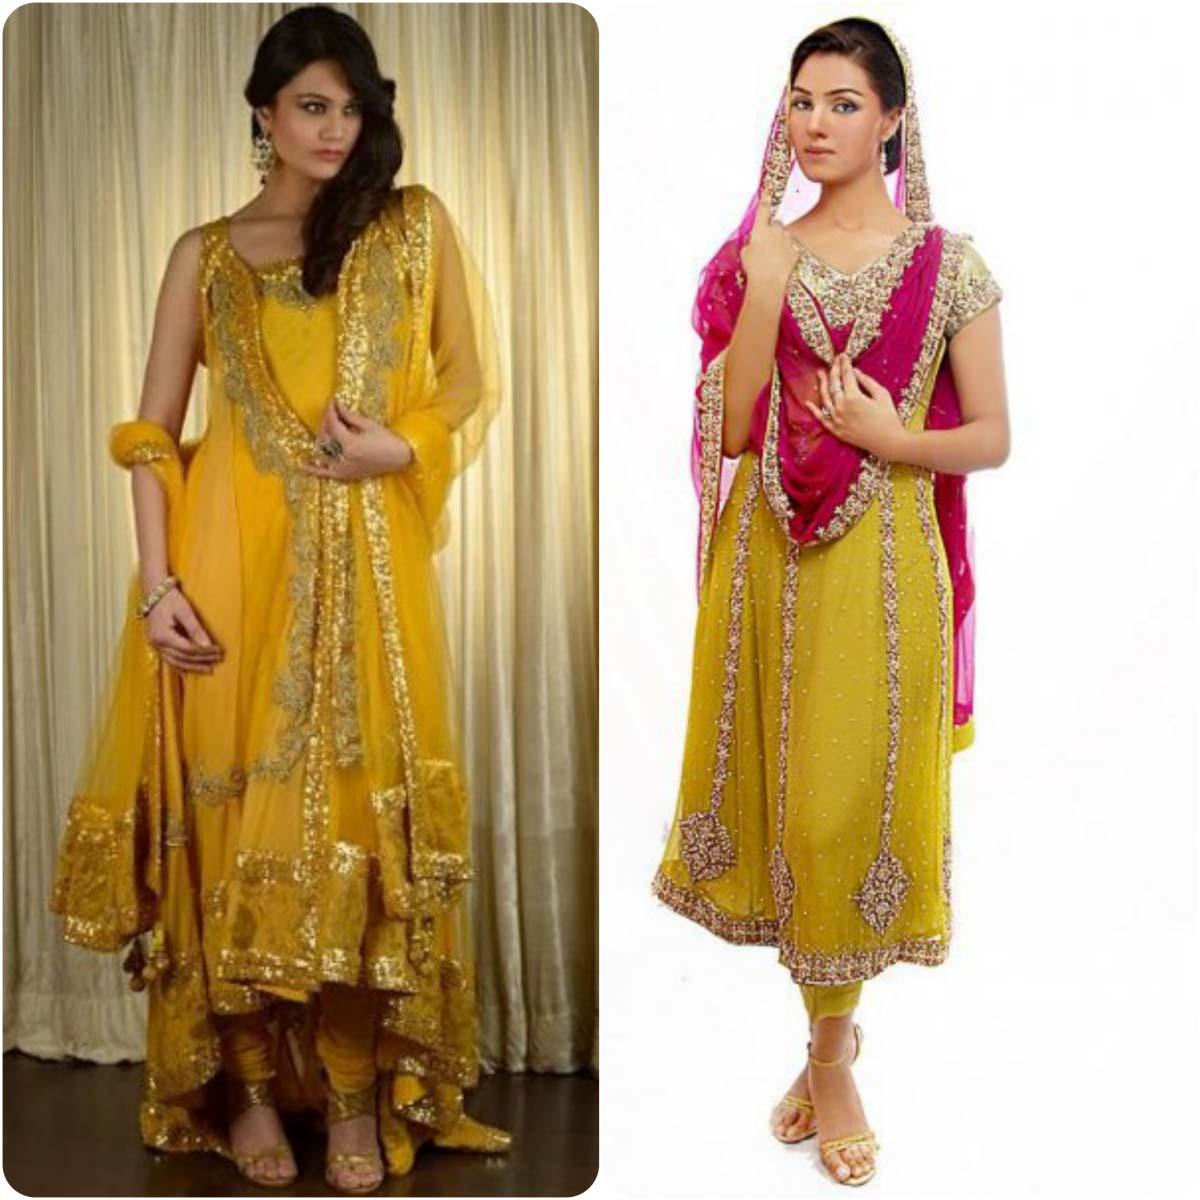 Beautiful Yellow Mehndi Dresses for Wedding Brides 2016-2017 (9)